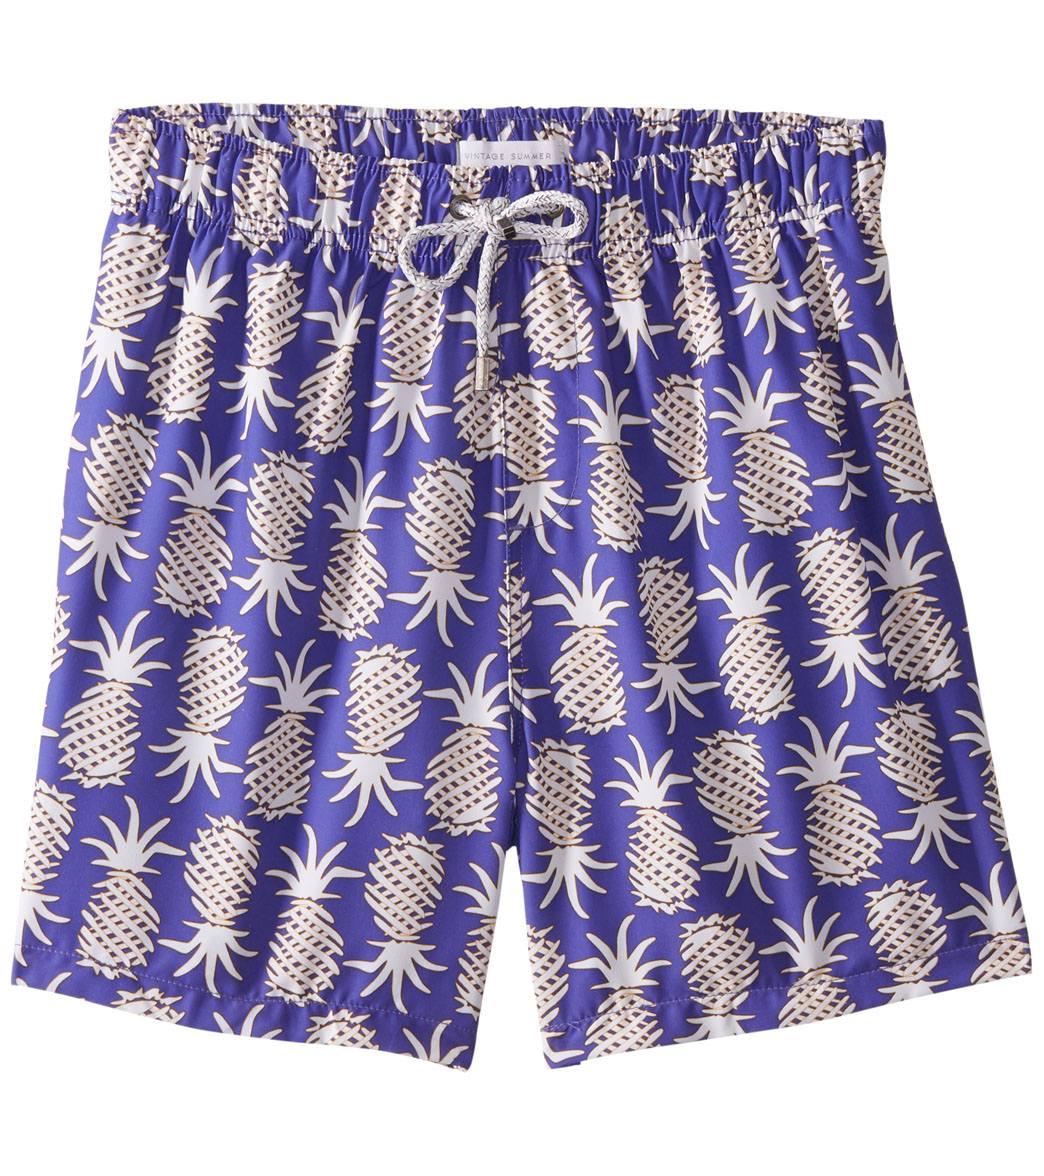 be72f526f3cc5 Vintage Summer Pineapple 5